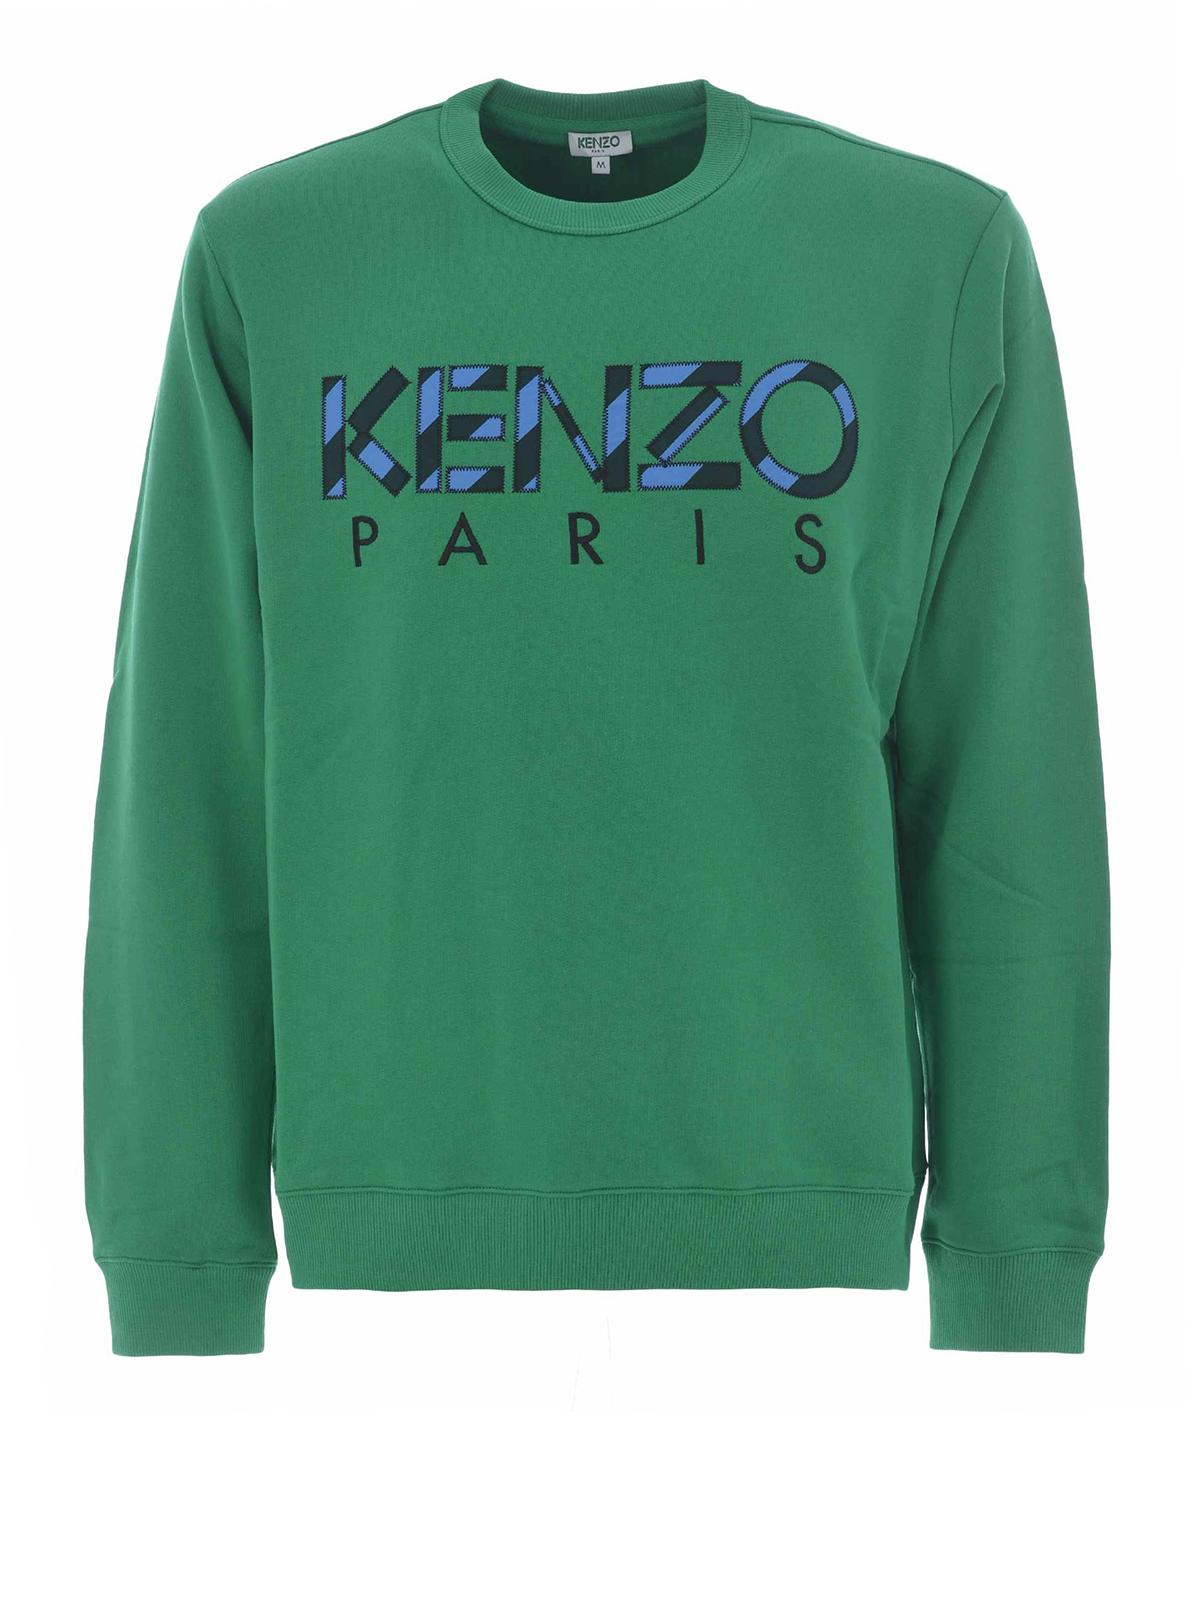 ab02f966 Kenzo - Kenzo green sweatshirt - Sweatshirts & Sweaters - F855SW0004MD57